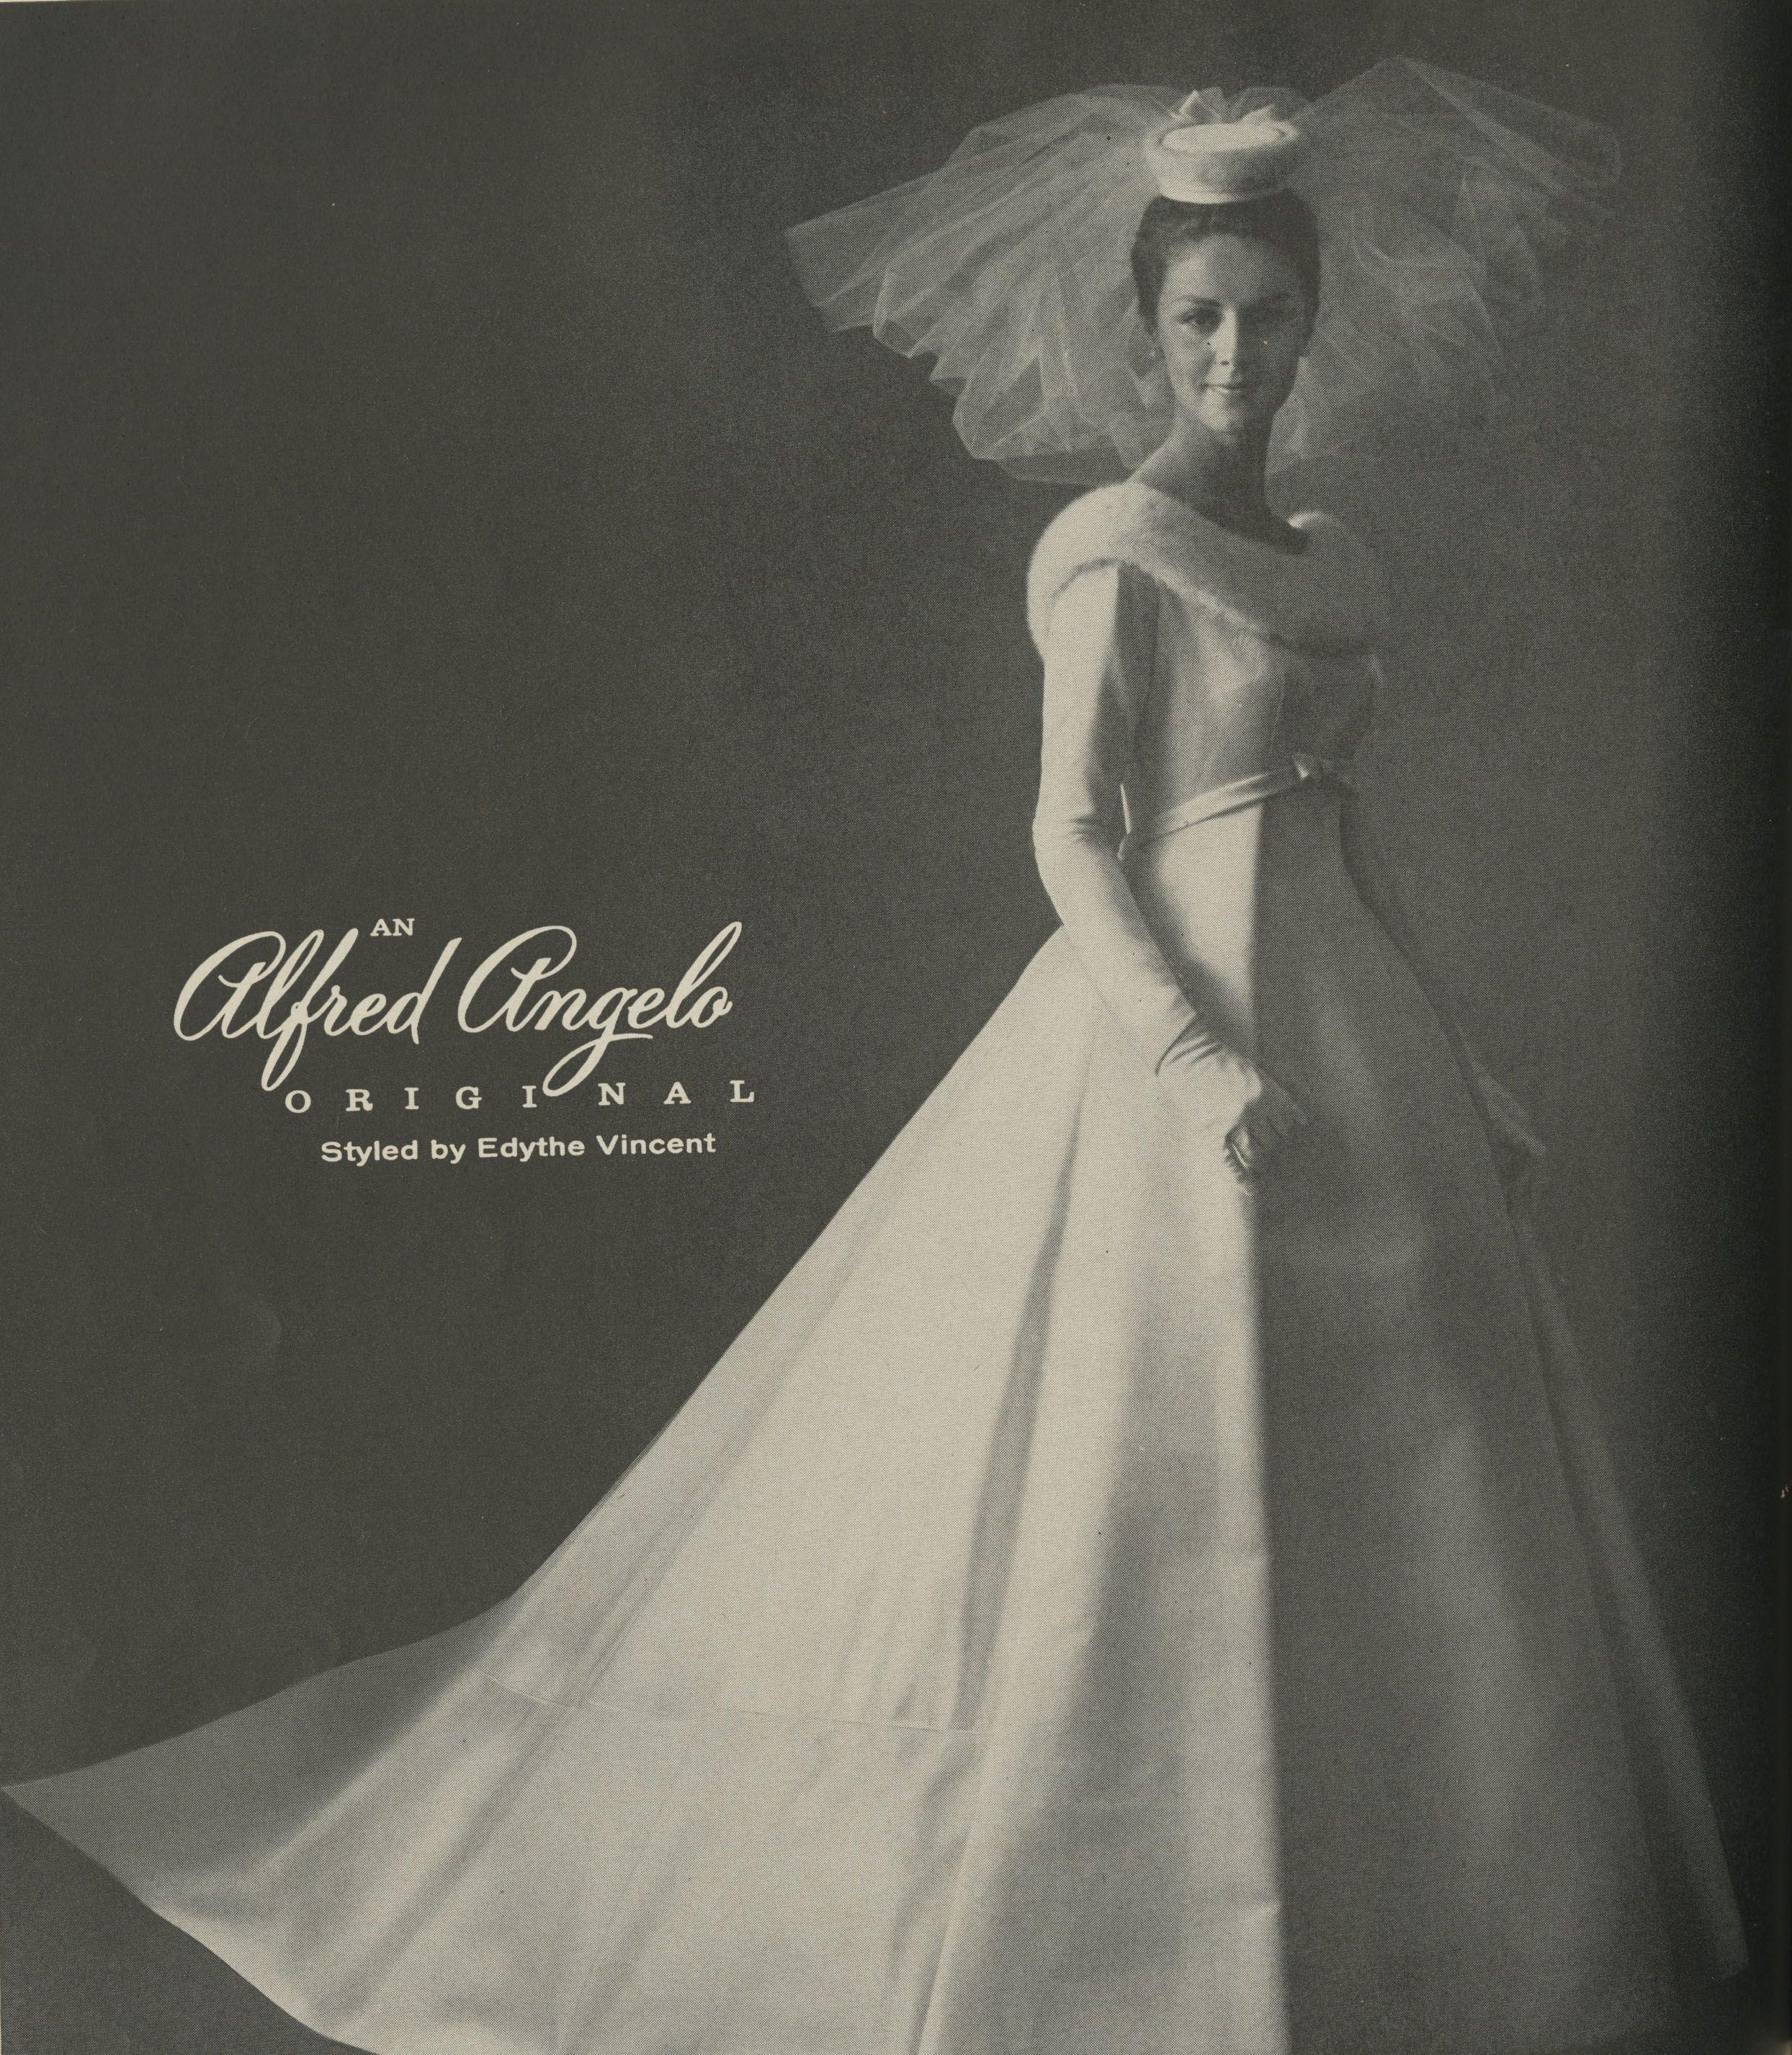 Vintage Wedding Dresses Las Vegas: An Alfred Angelo Original Styled By Edythe Vincent